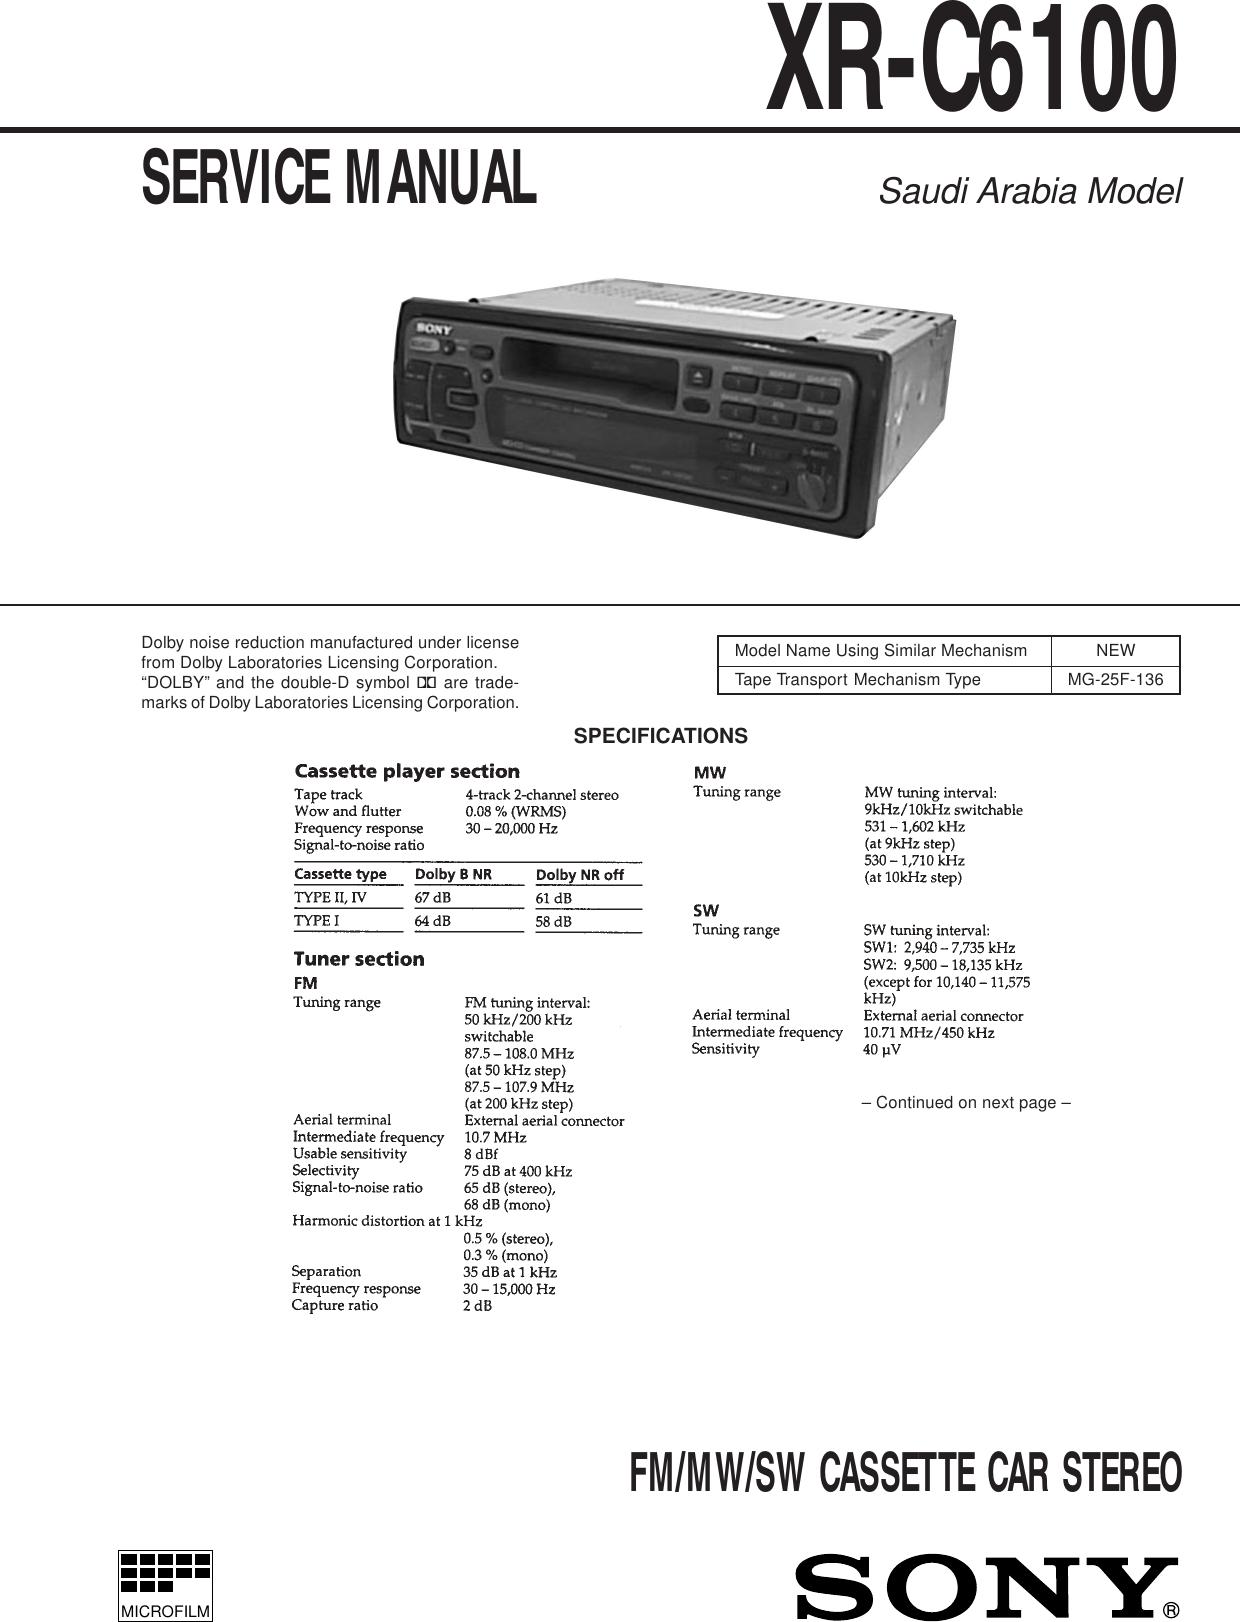 Sony Car Audio Manuals Dsx S300btx Wiring Diagram Array Stereo System Xr C6100 Users Manual Rh Usermanual Wiki